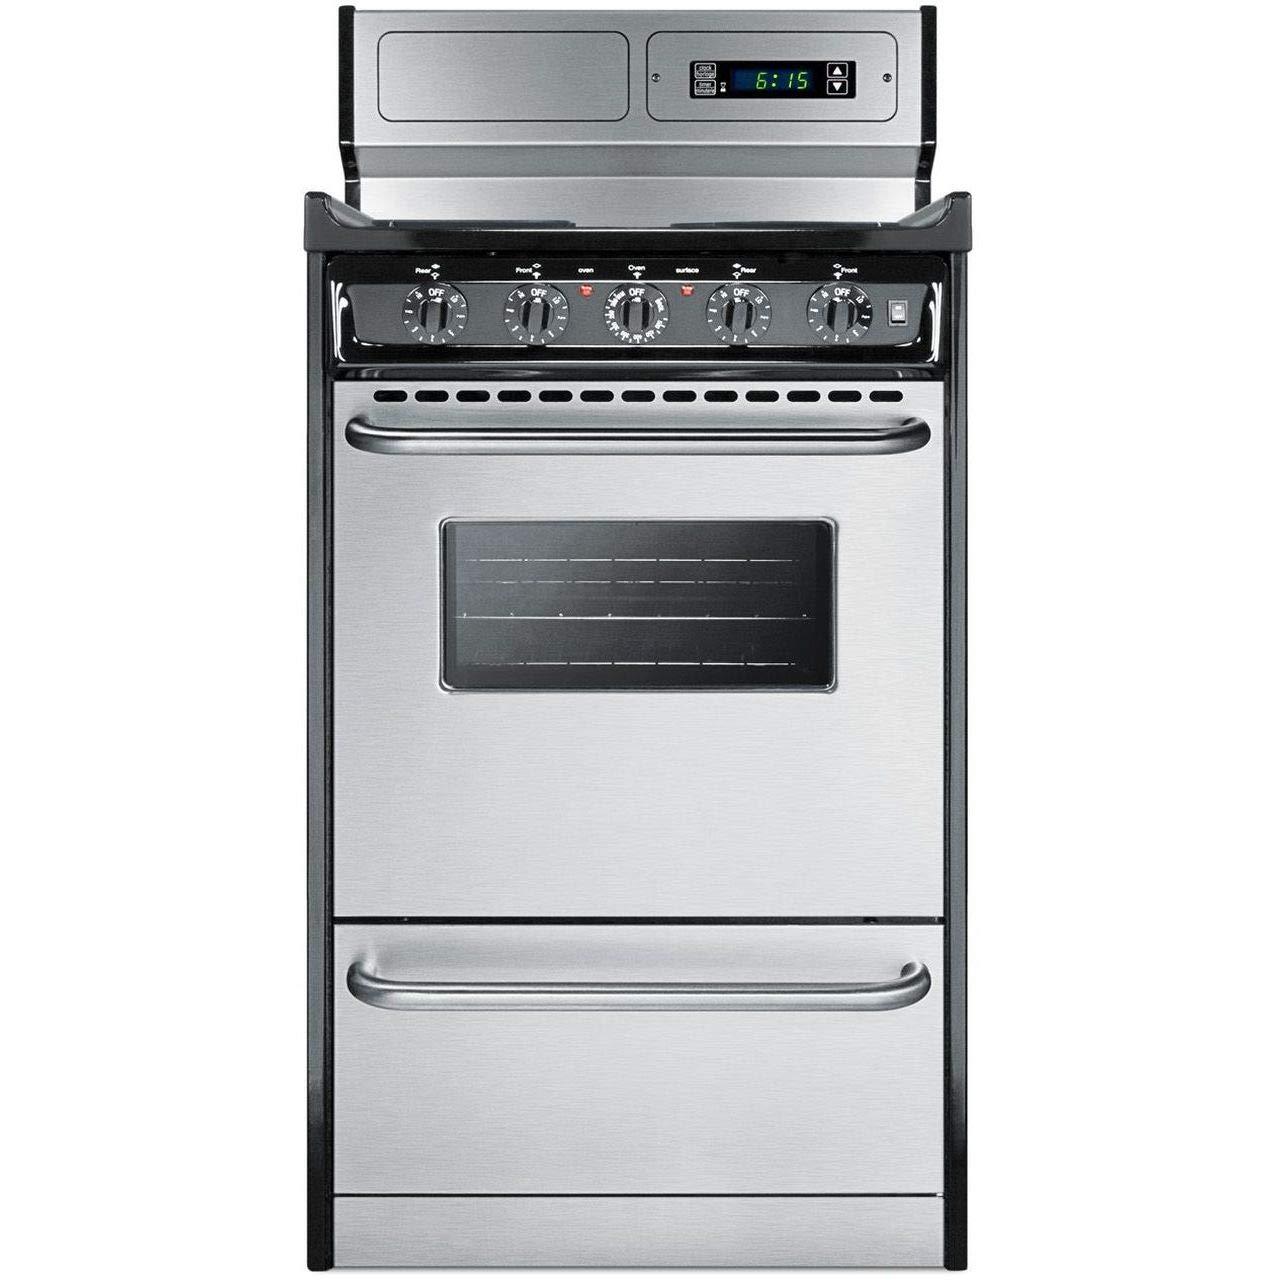 Amazon Com Summit Appliance Tem130bkwy Kitchen Cooking Range Stainless Steel Appliances